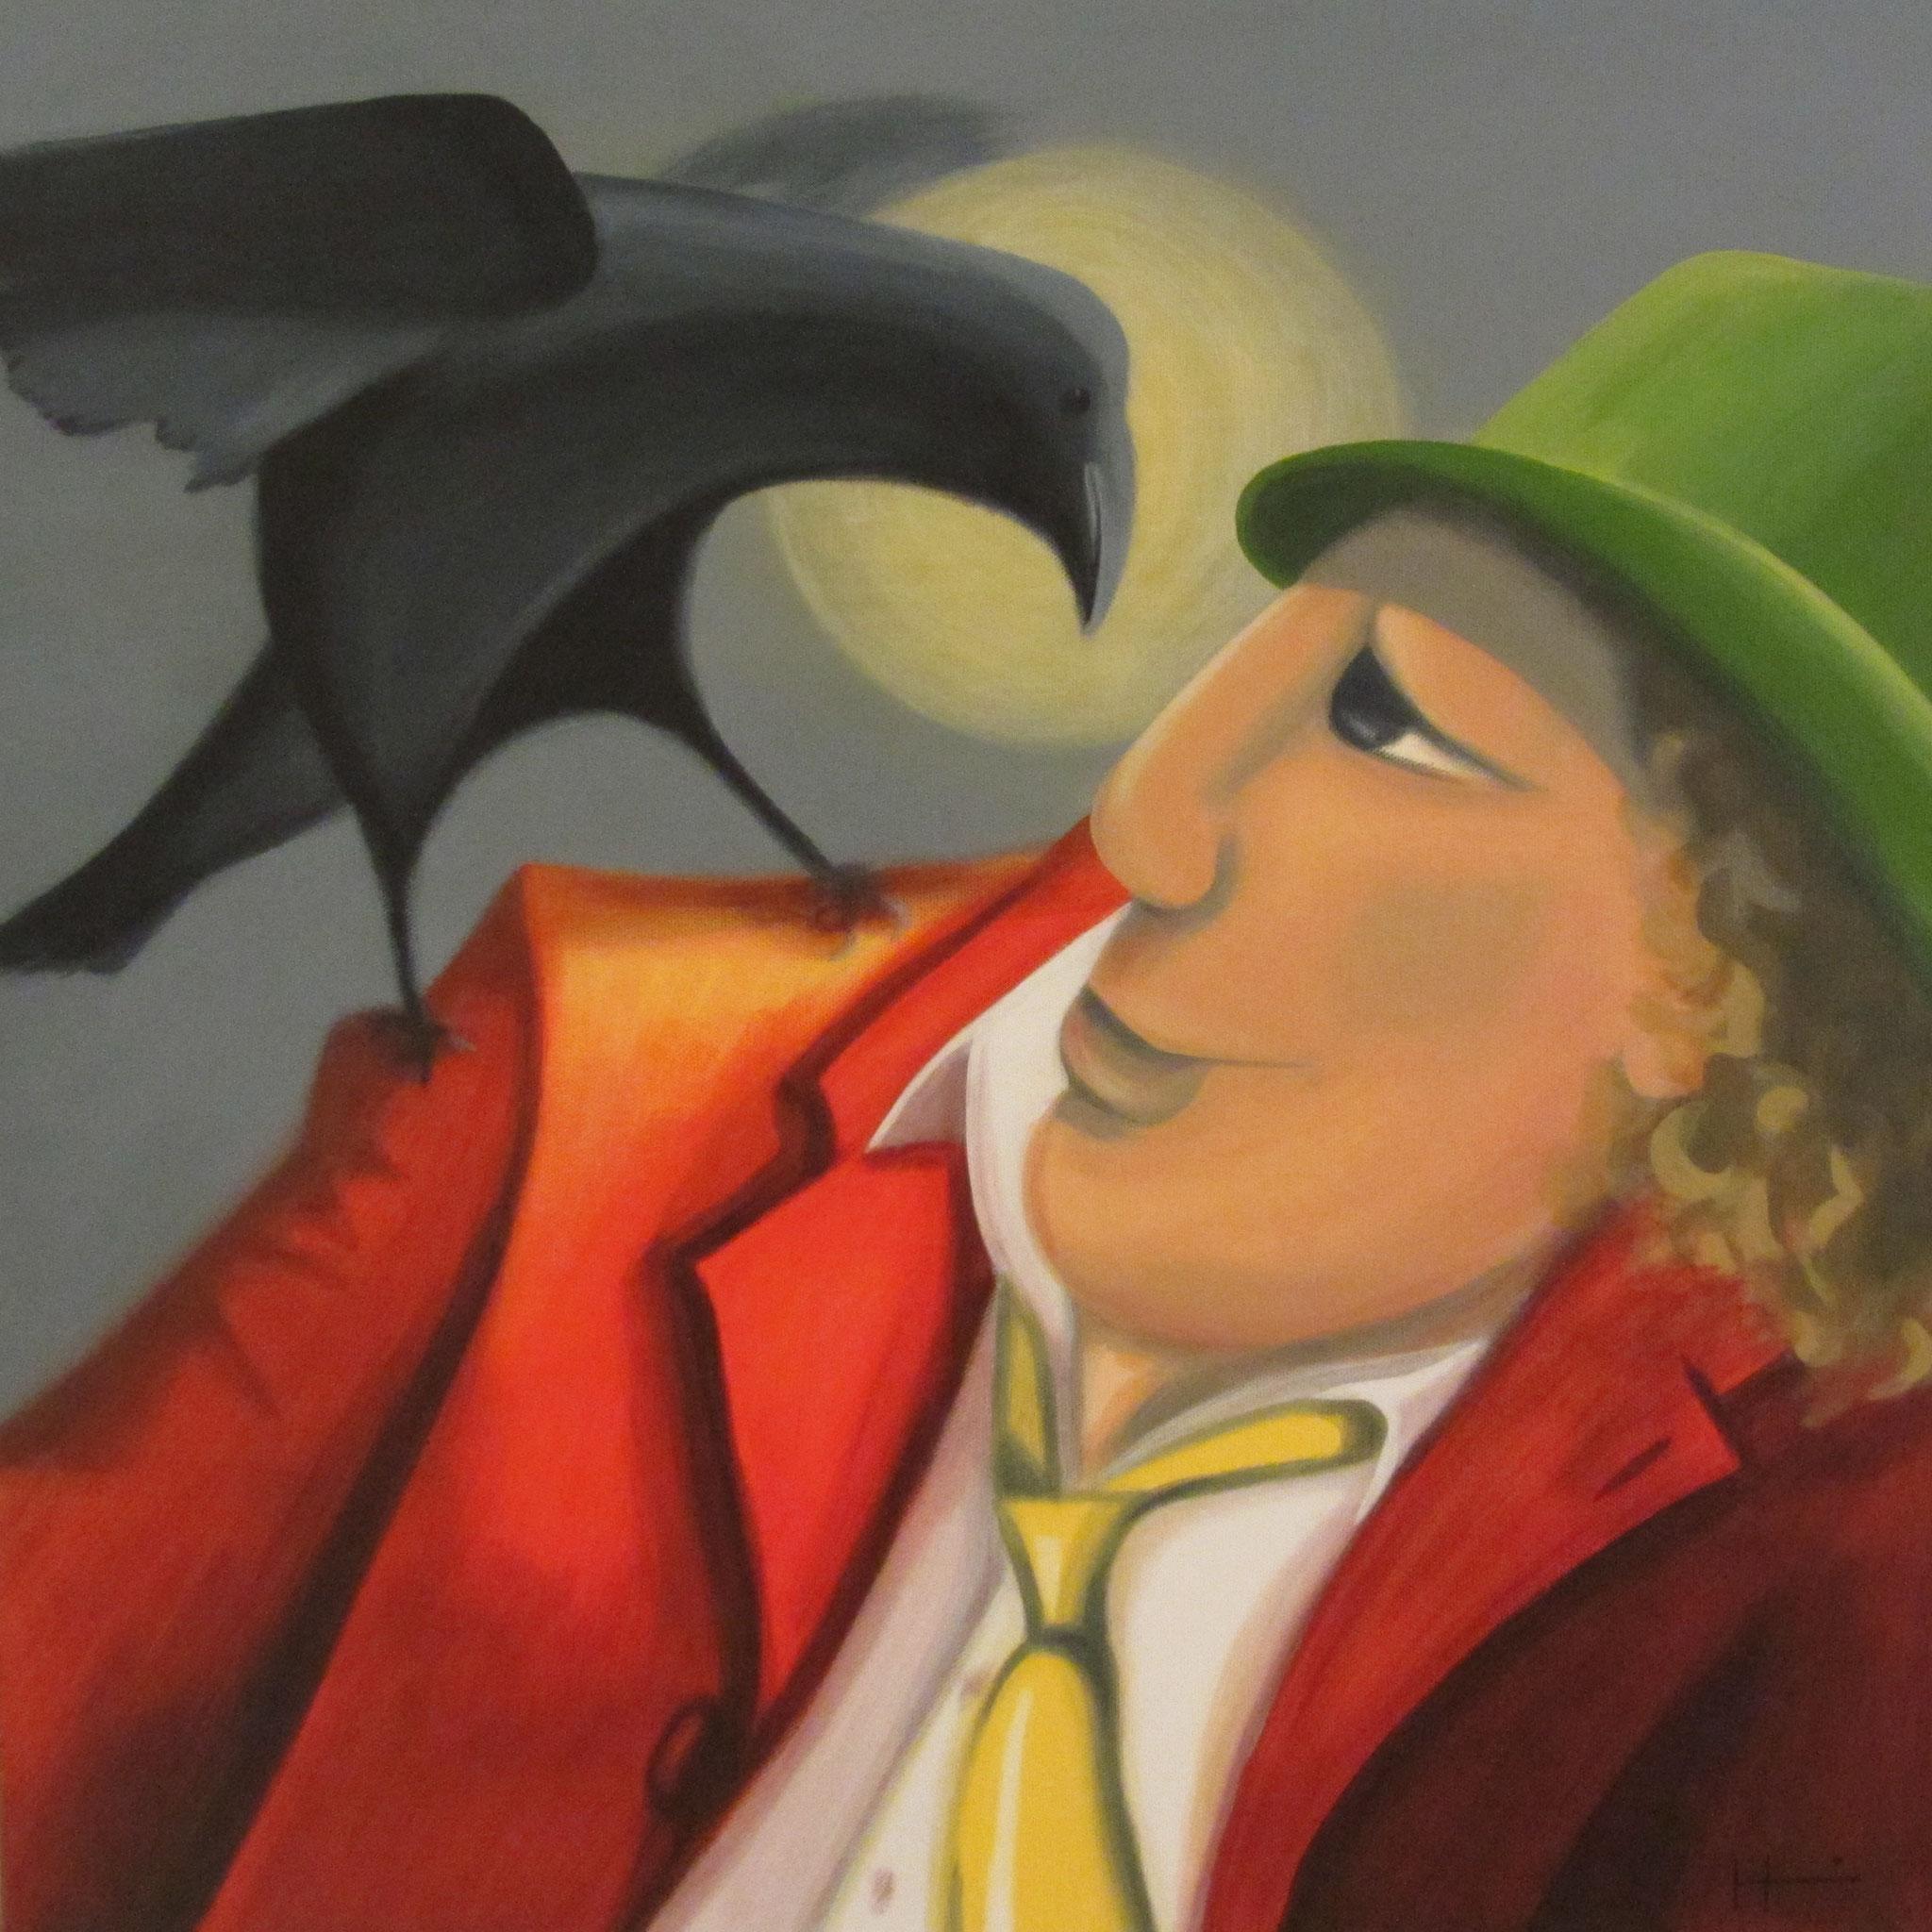 """Vogel der Nacht"", 60x60 cm, Renate Hugenschmidt"